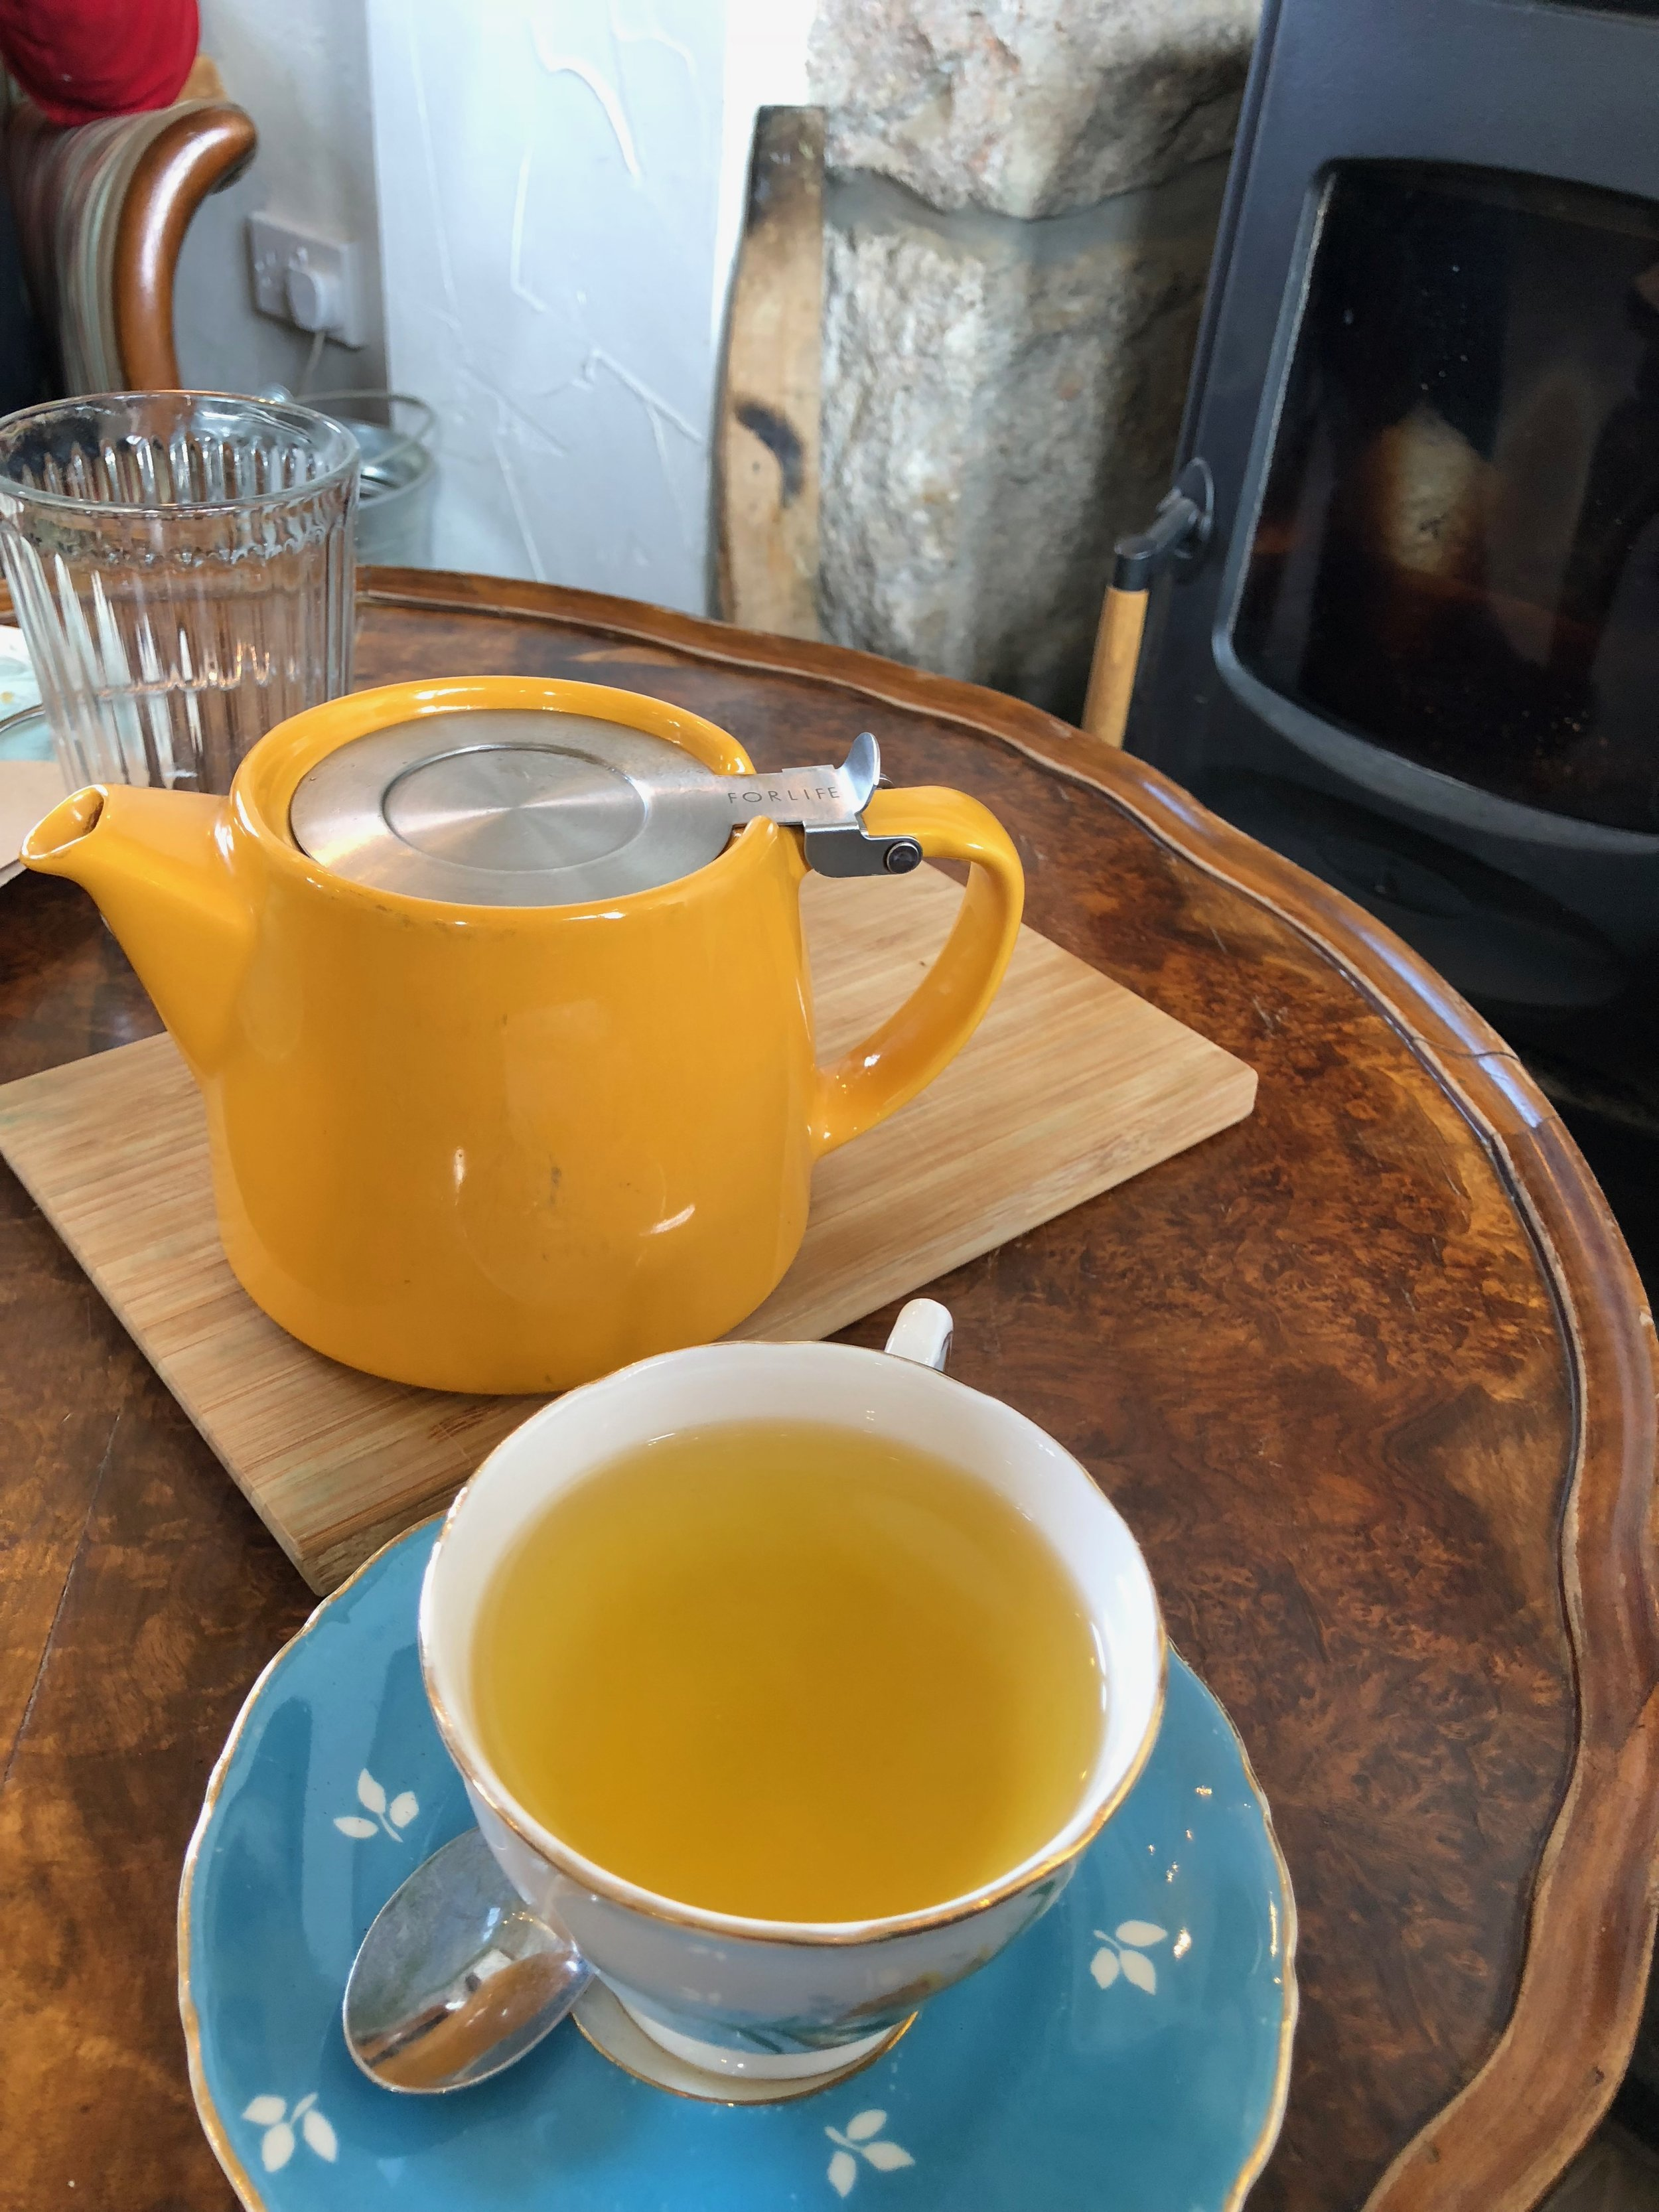 Turmeric tea has been a staple for me so far. So many anti-inflammatory benefits!